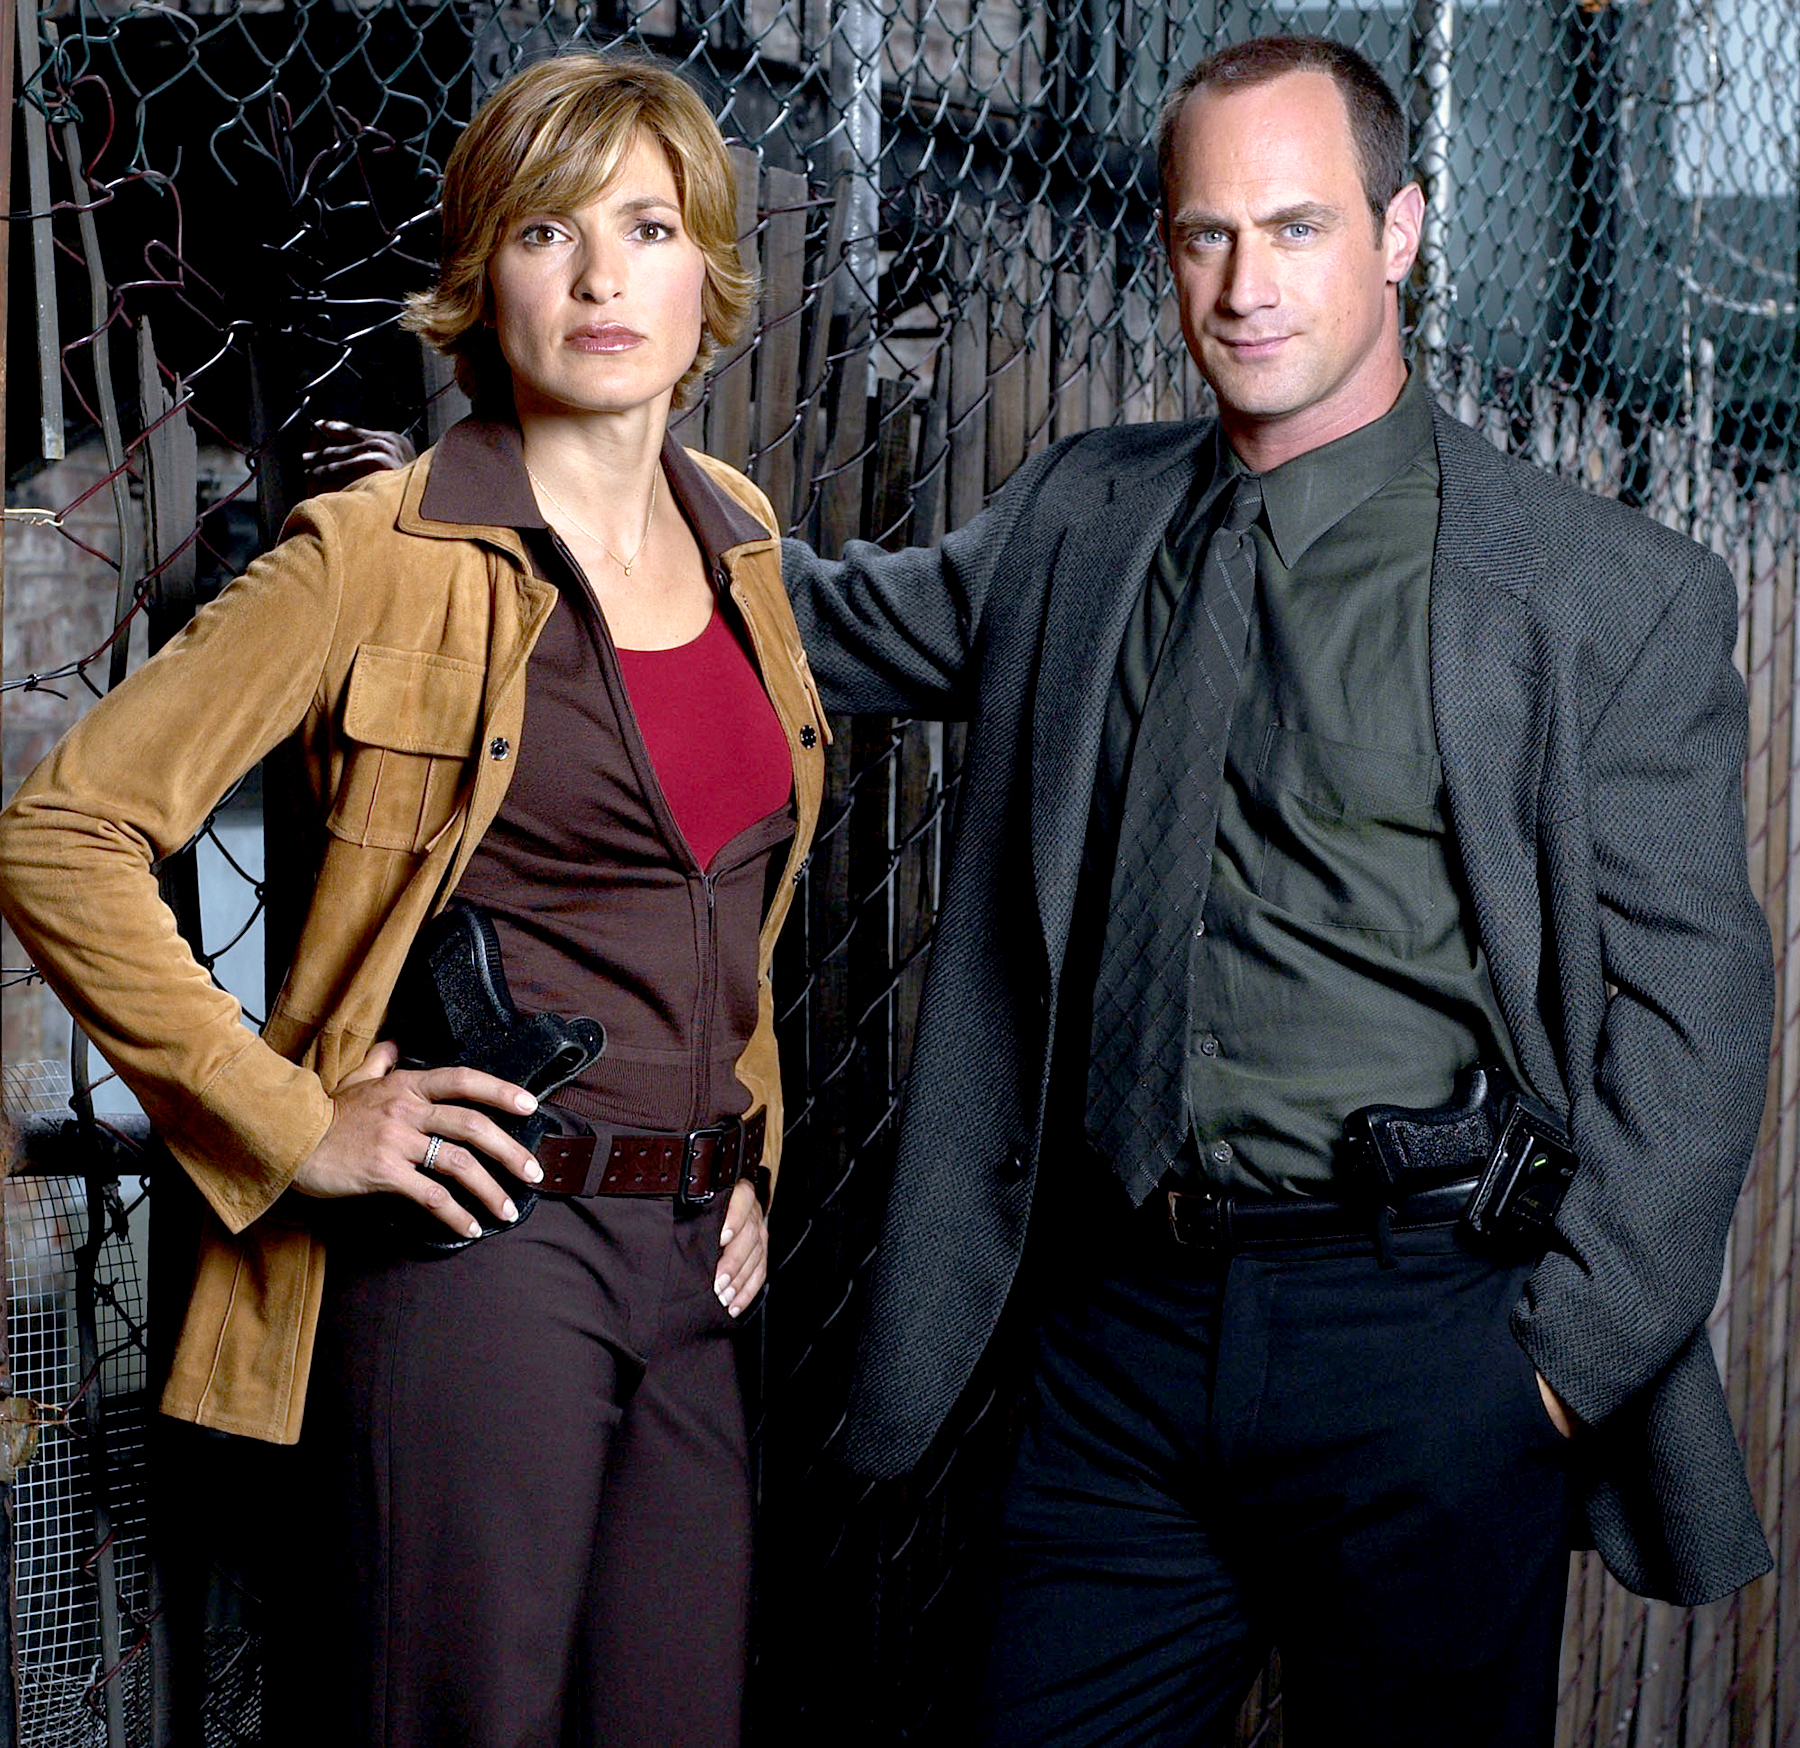 Mariska Hargitay as Detective Olivia Benson and Christopher Meloni as Detective Elliot Stabler